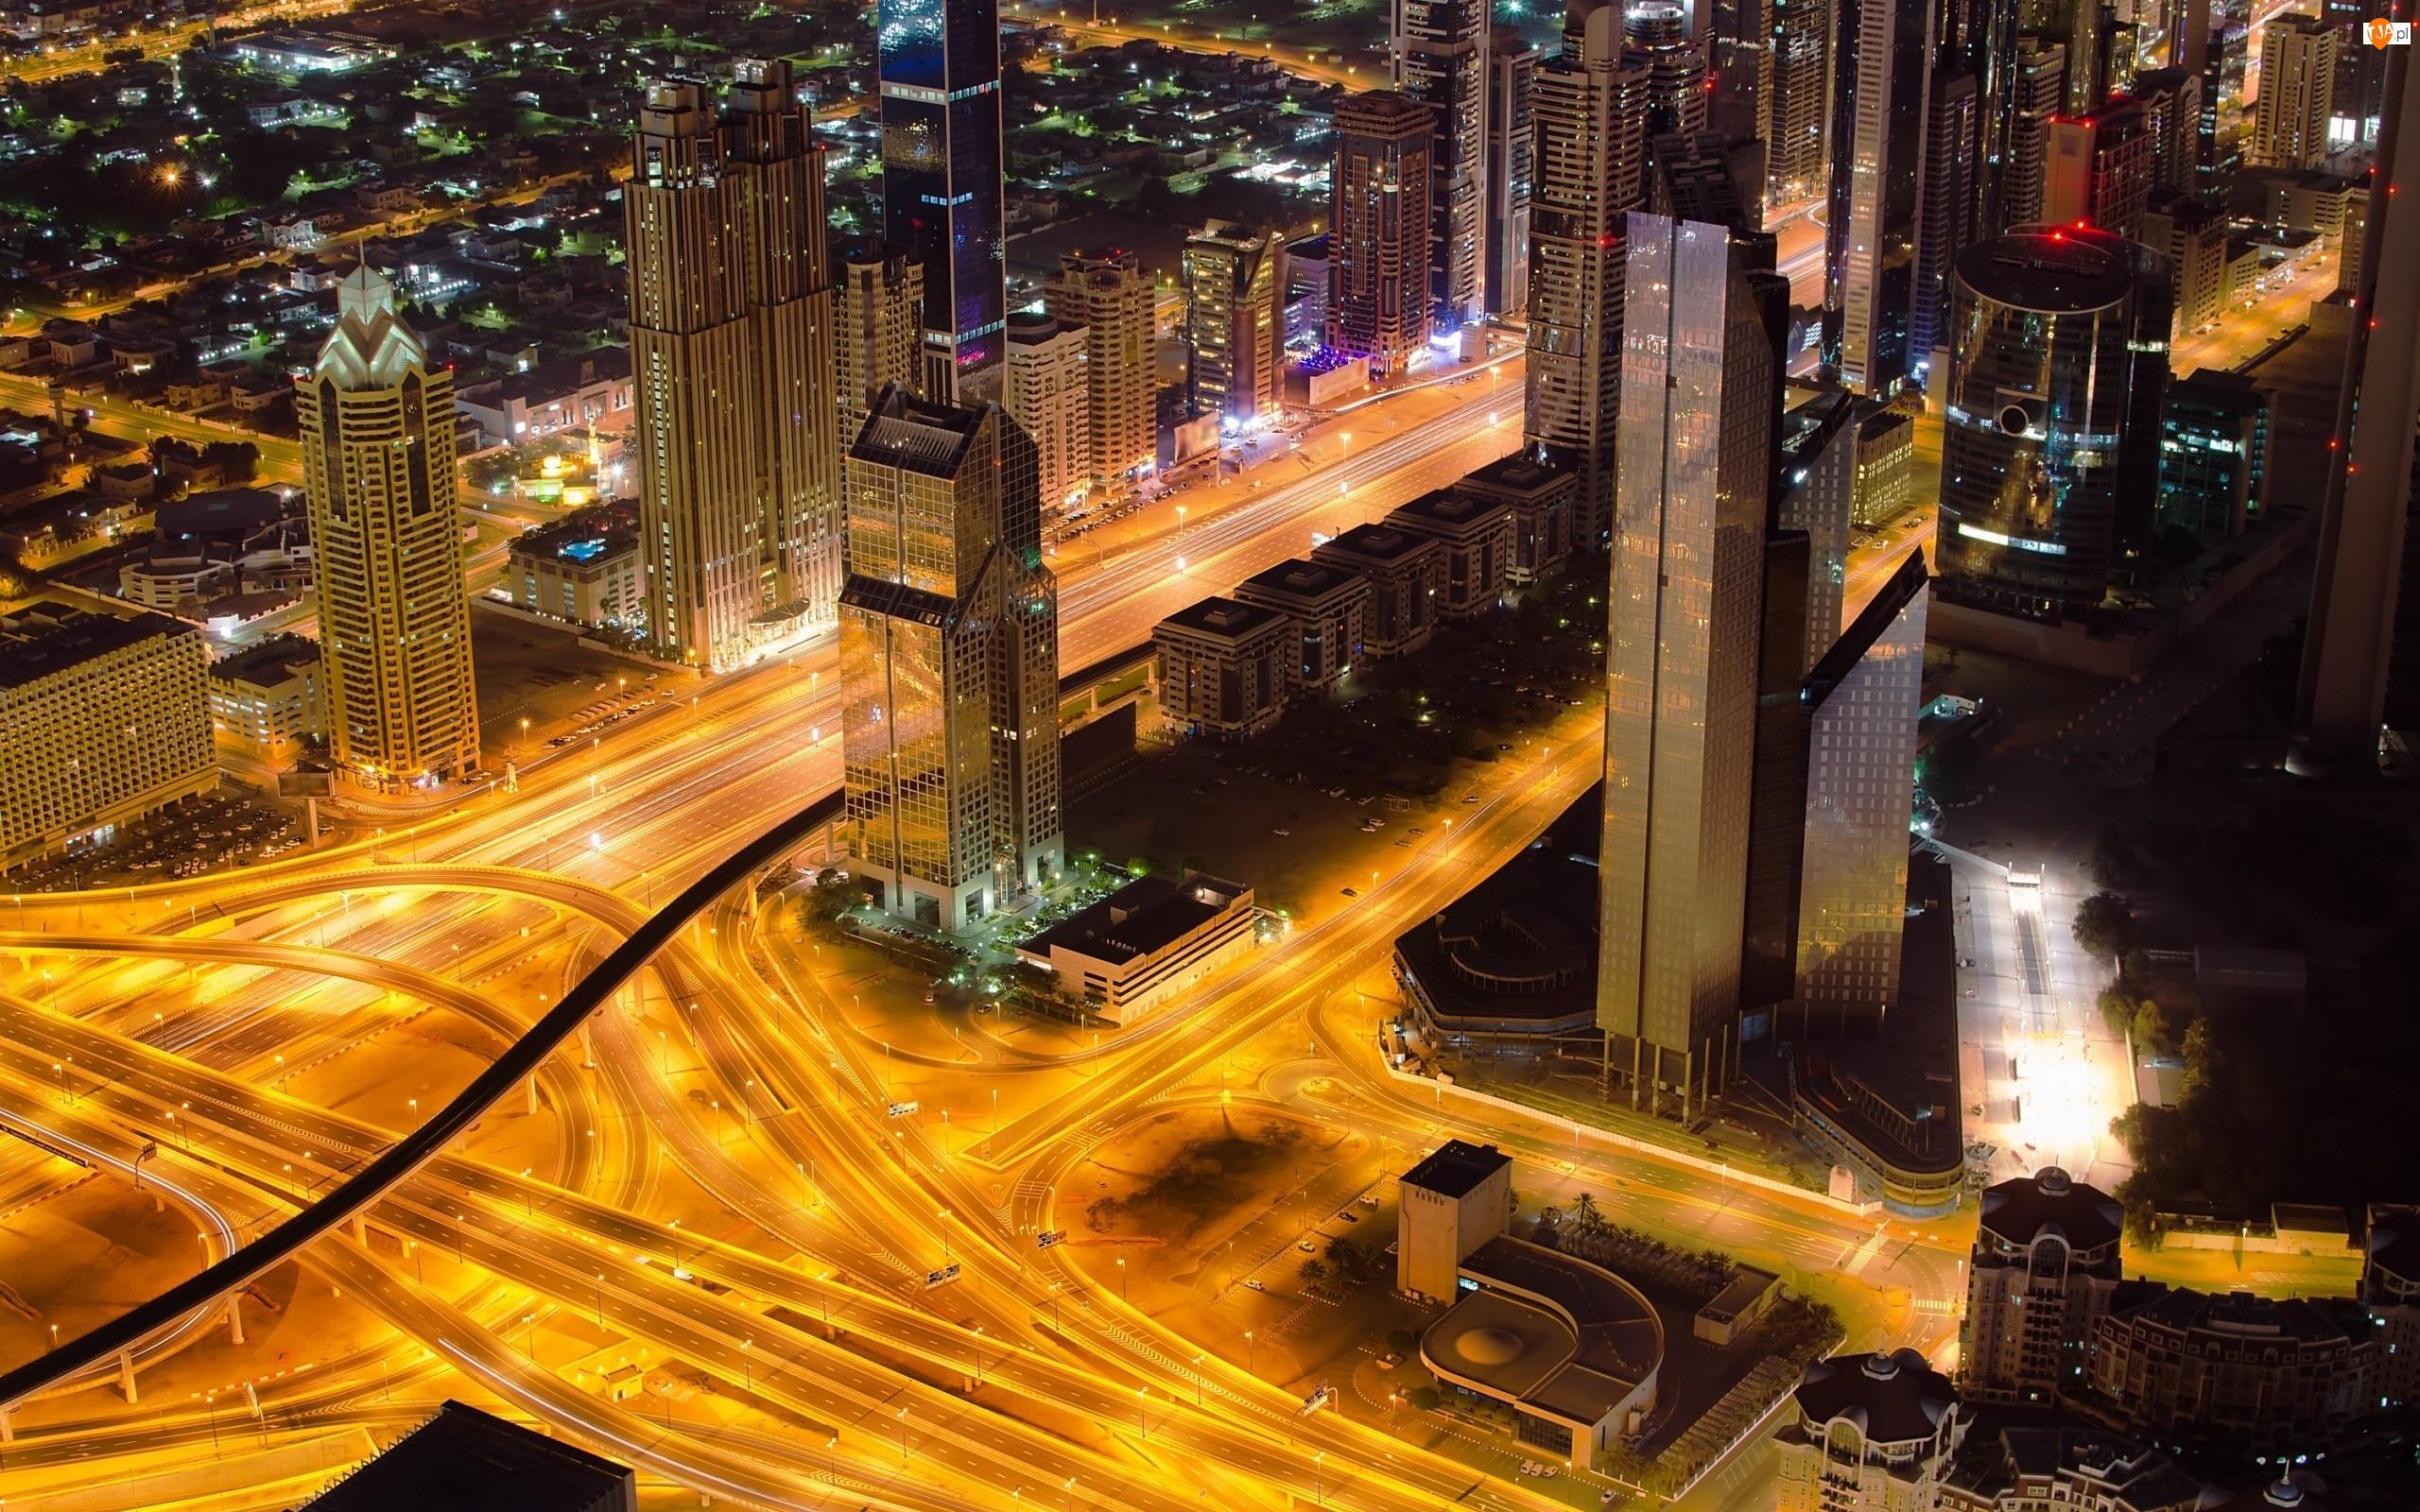 Chmur, Ulice, Dubaj, Drapacze, Noc, Miasta, Panorama